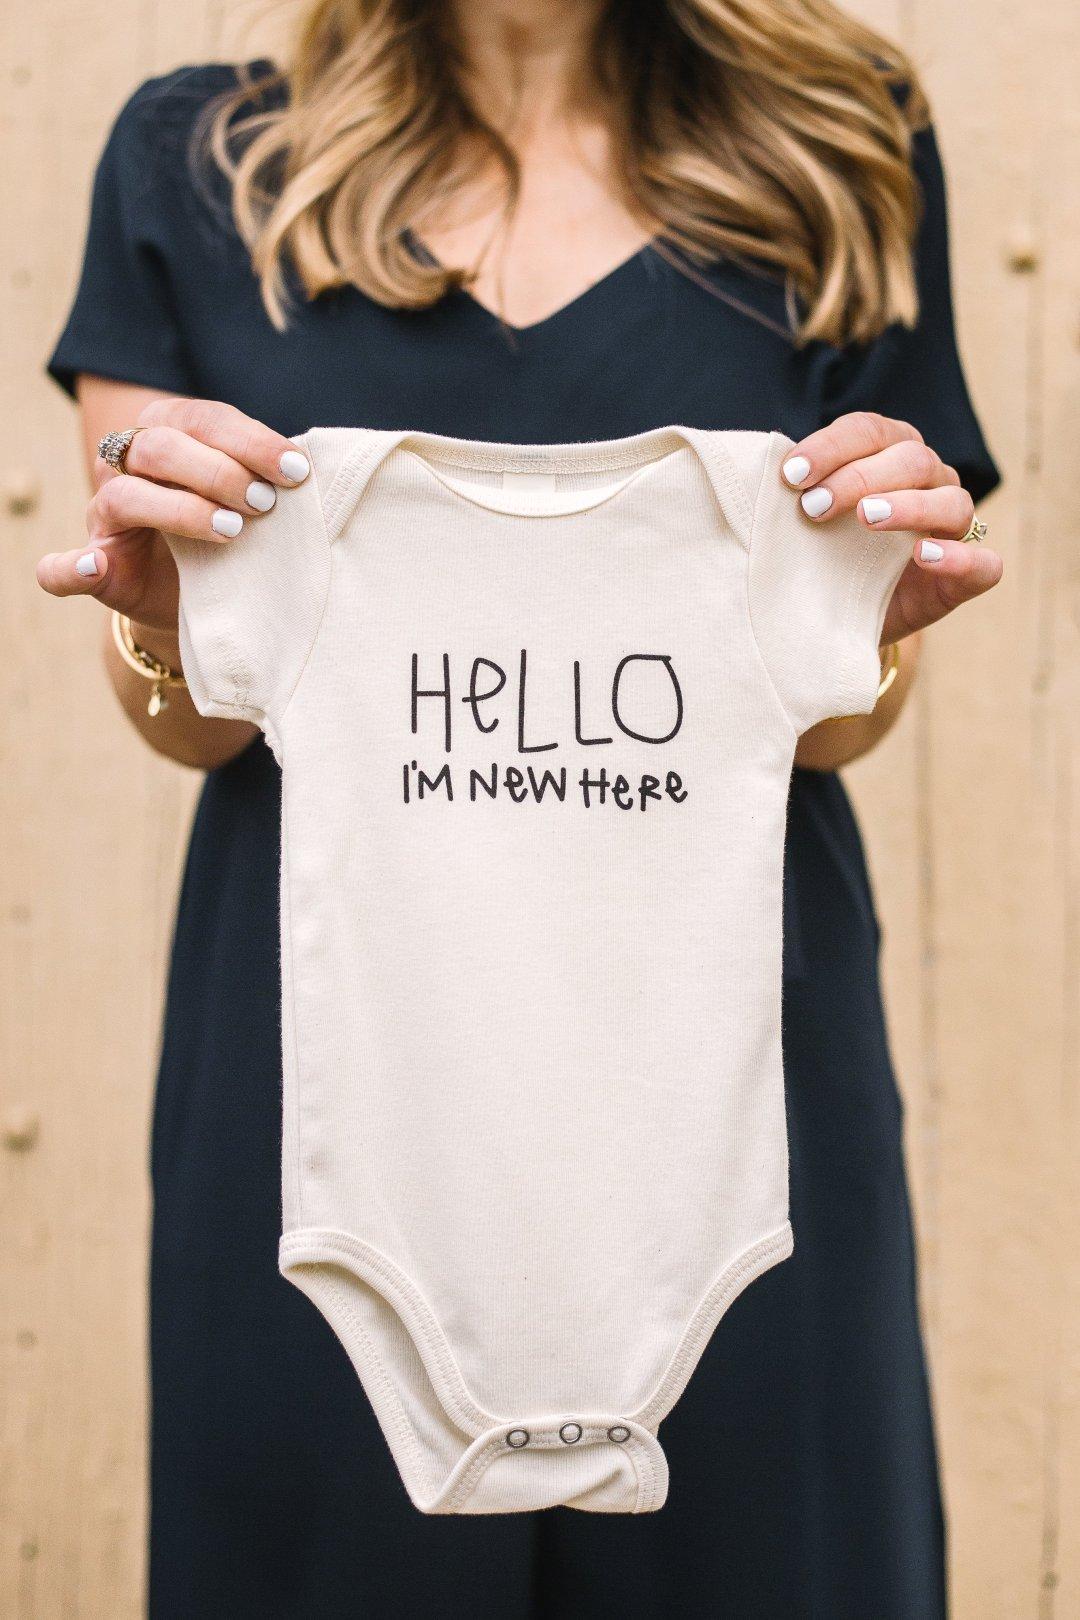 A little news + pregnancy announcement